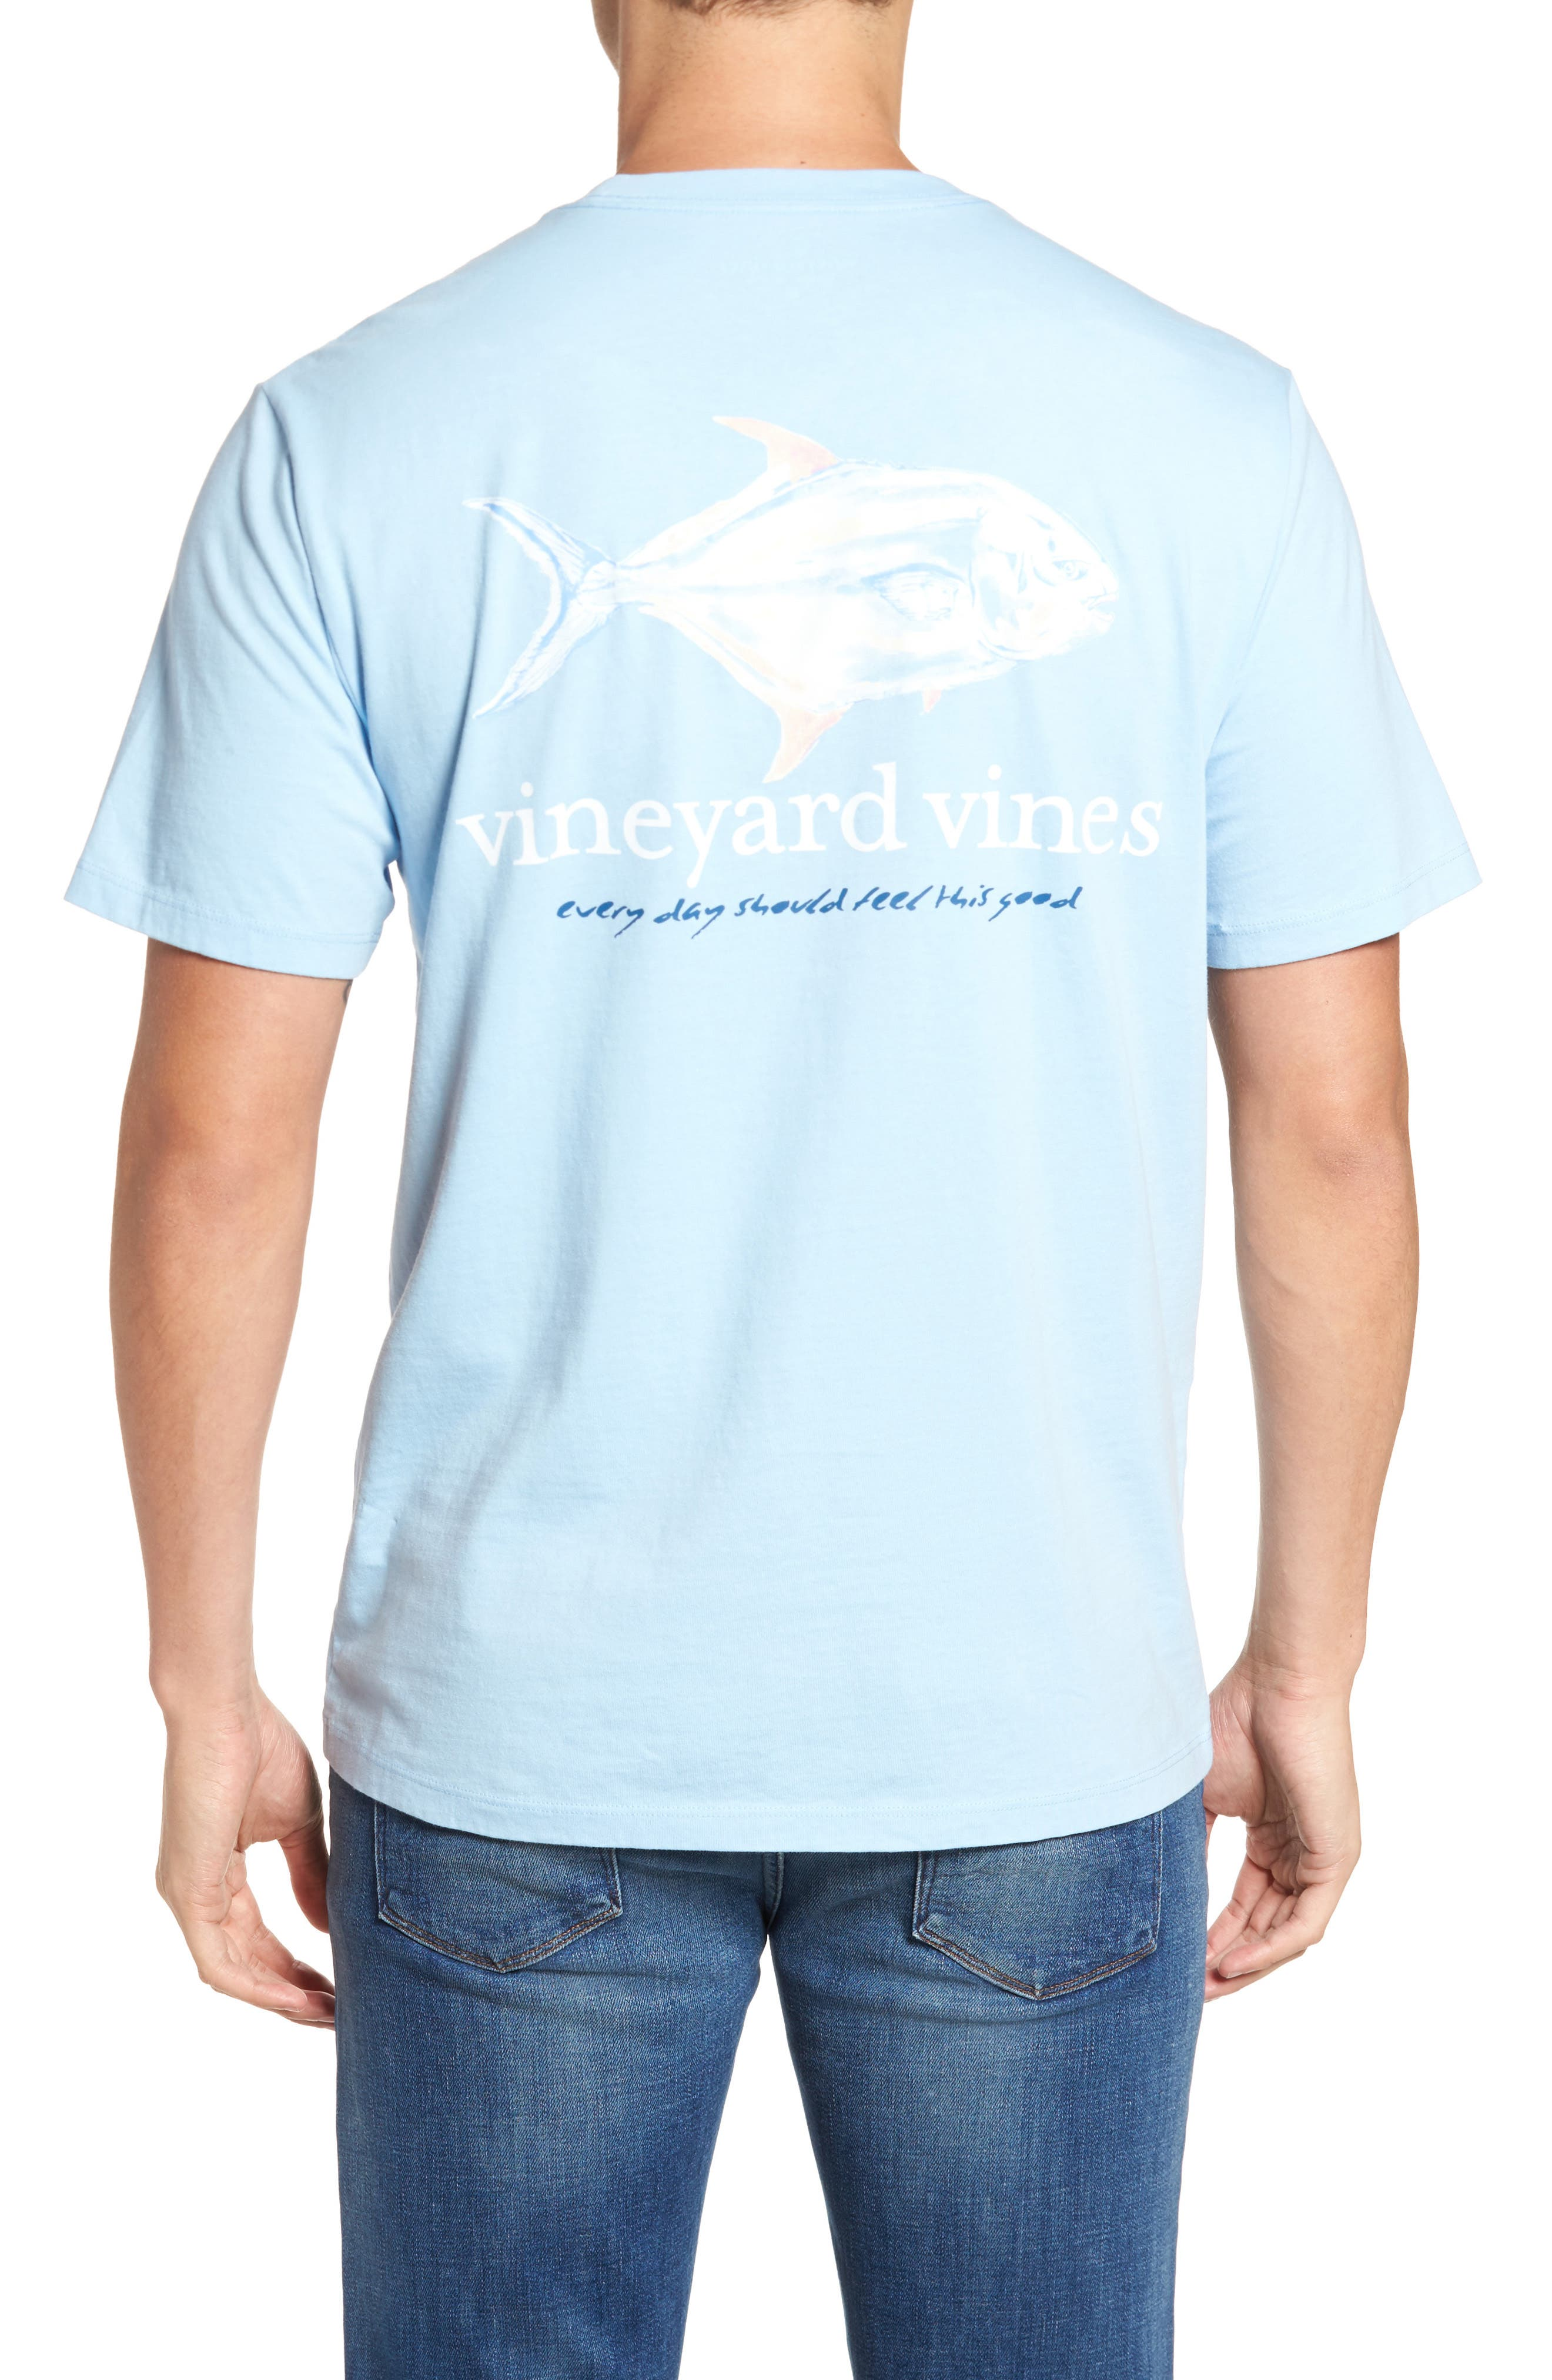 Alternate Image 1 Selected - vineyard vines Painted Permit Graphic Pocket T-Shirt